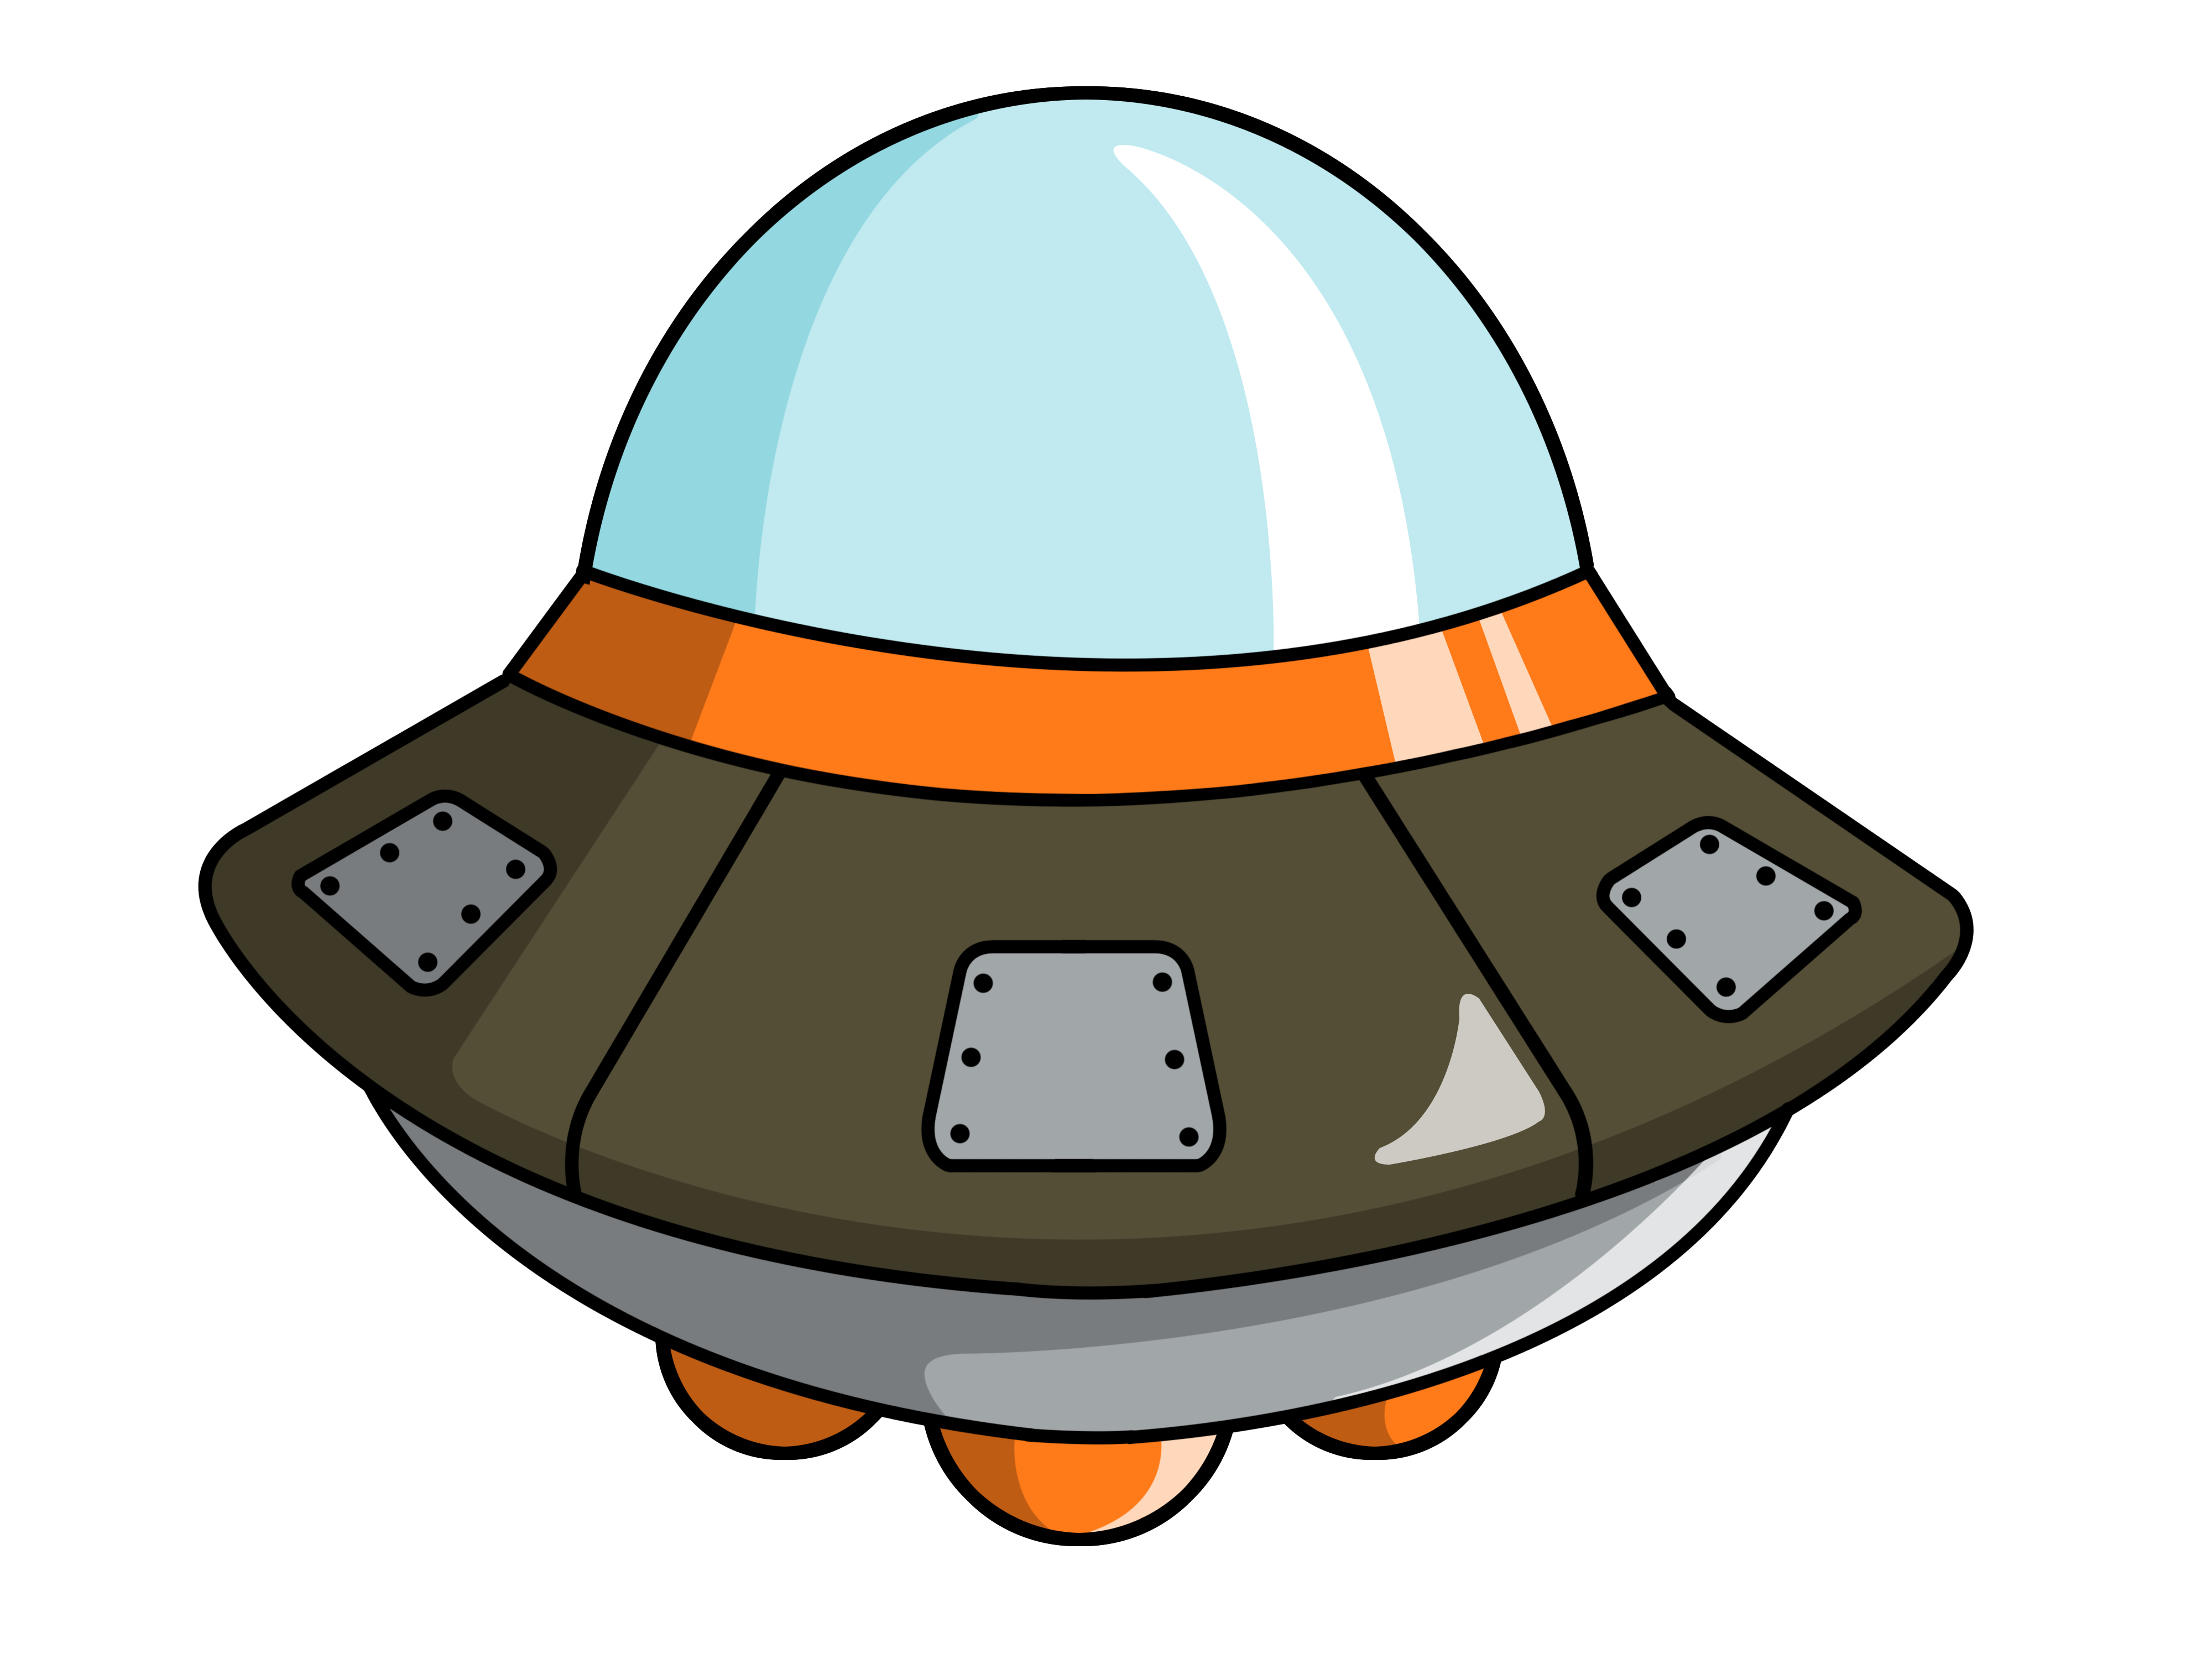 Cartoon Space Ship